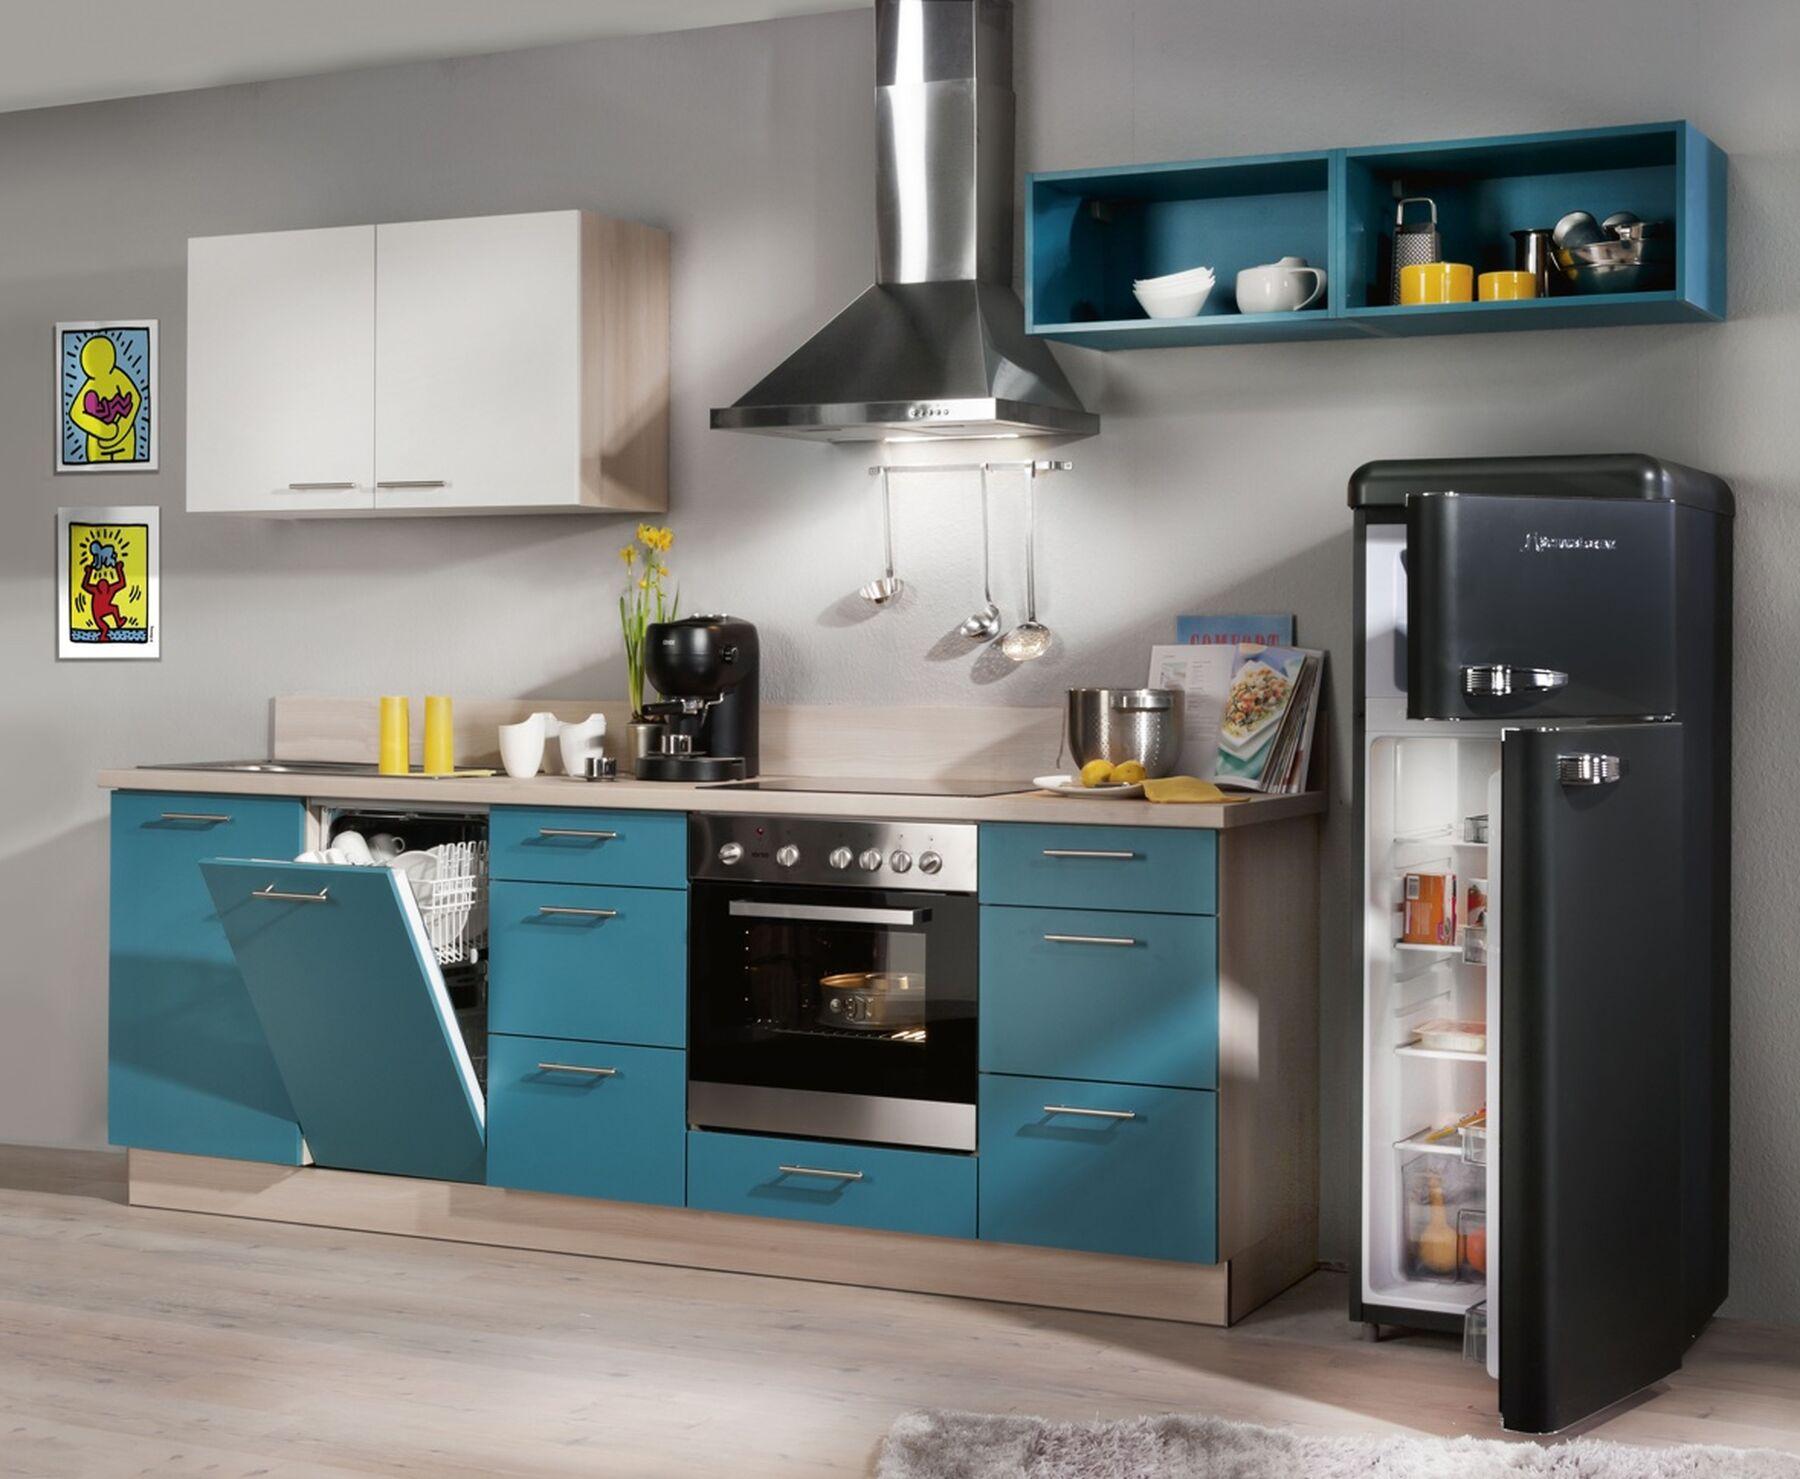 elektro ger te service zubeh r m belix k chen online shop. Black Bedroom Furniture Sets. Home Design Ideas